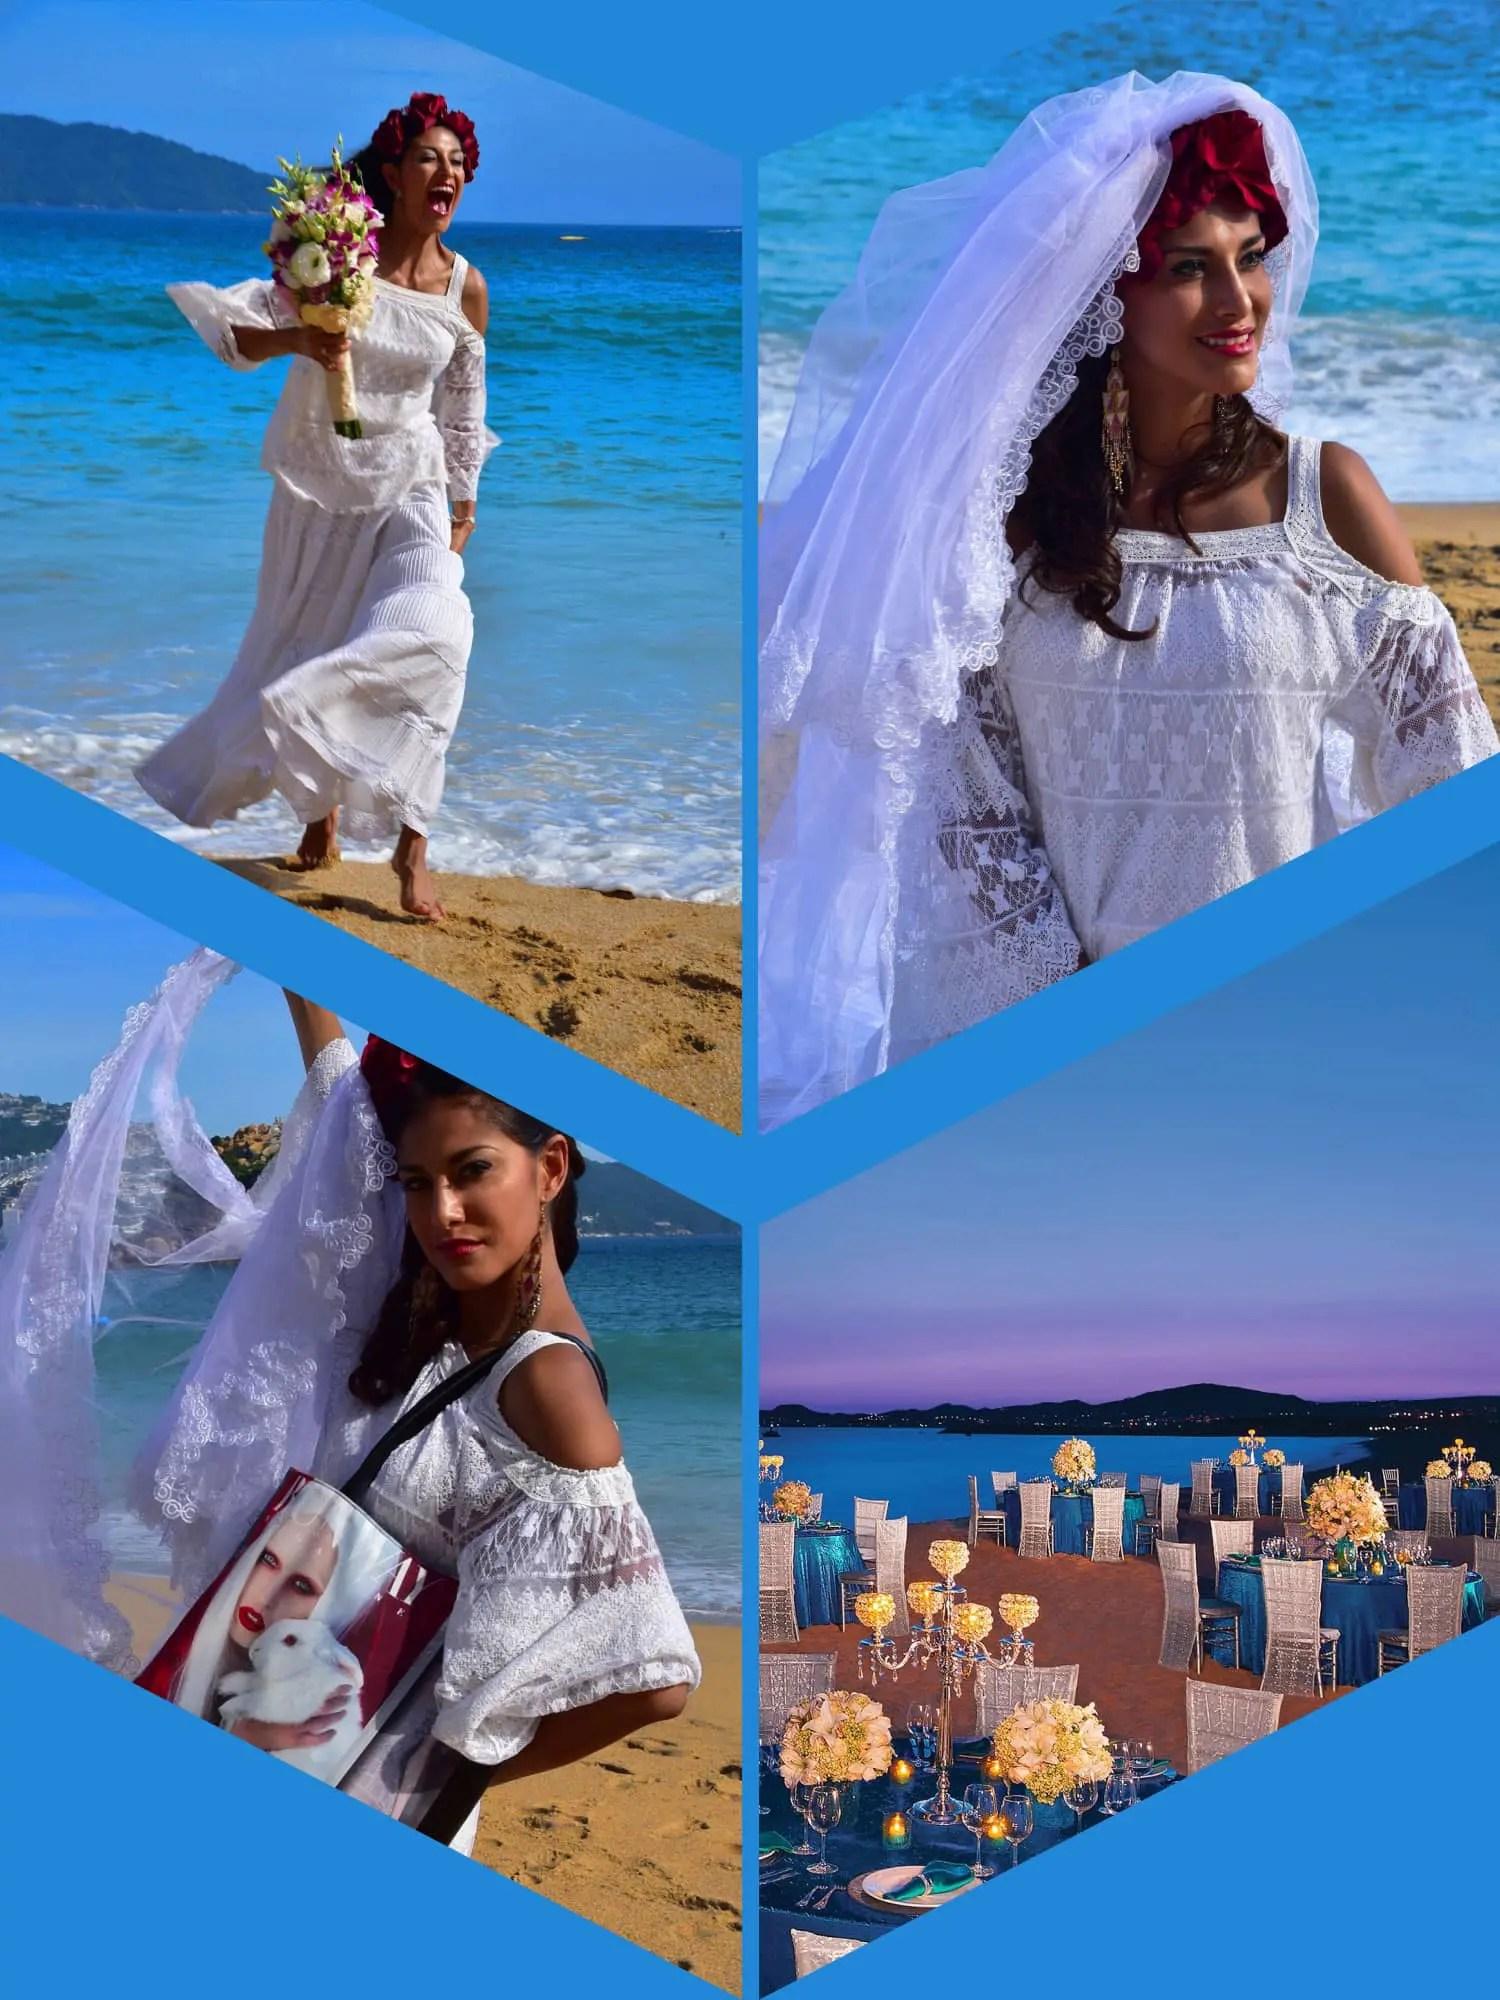 Runway-Magazine-Bag-Acapulco-Wedding-Destination-Eleonora-deGray-Runway-Magazine-USA-Runway-Magazine-France